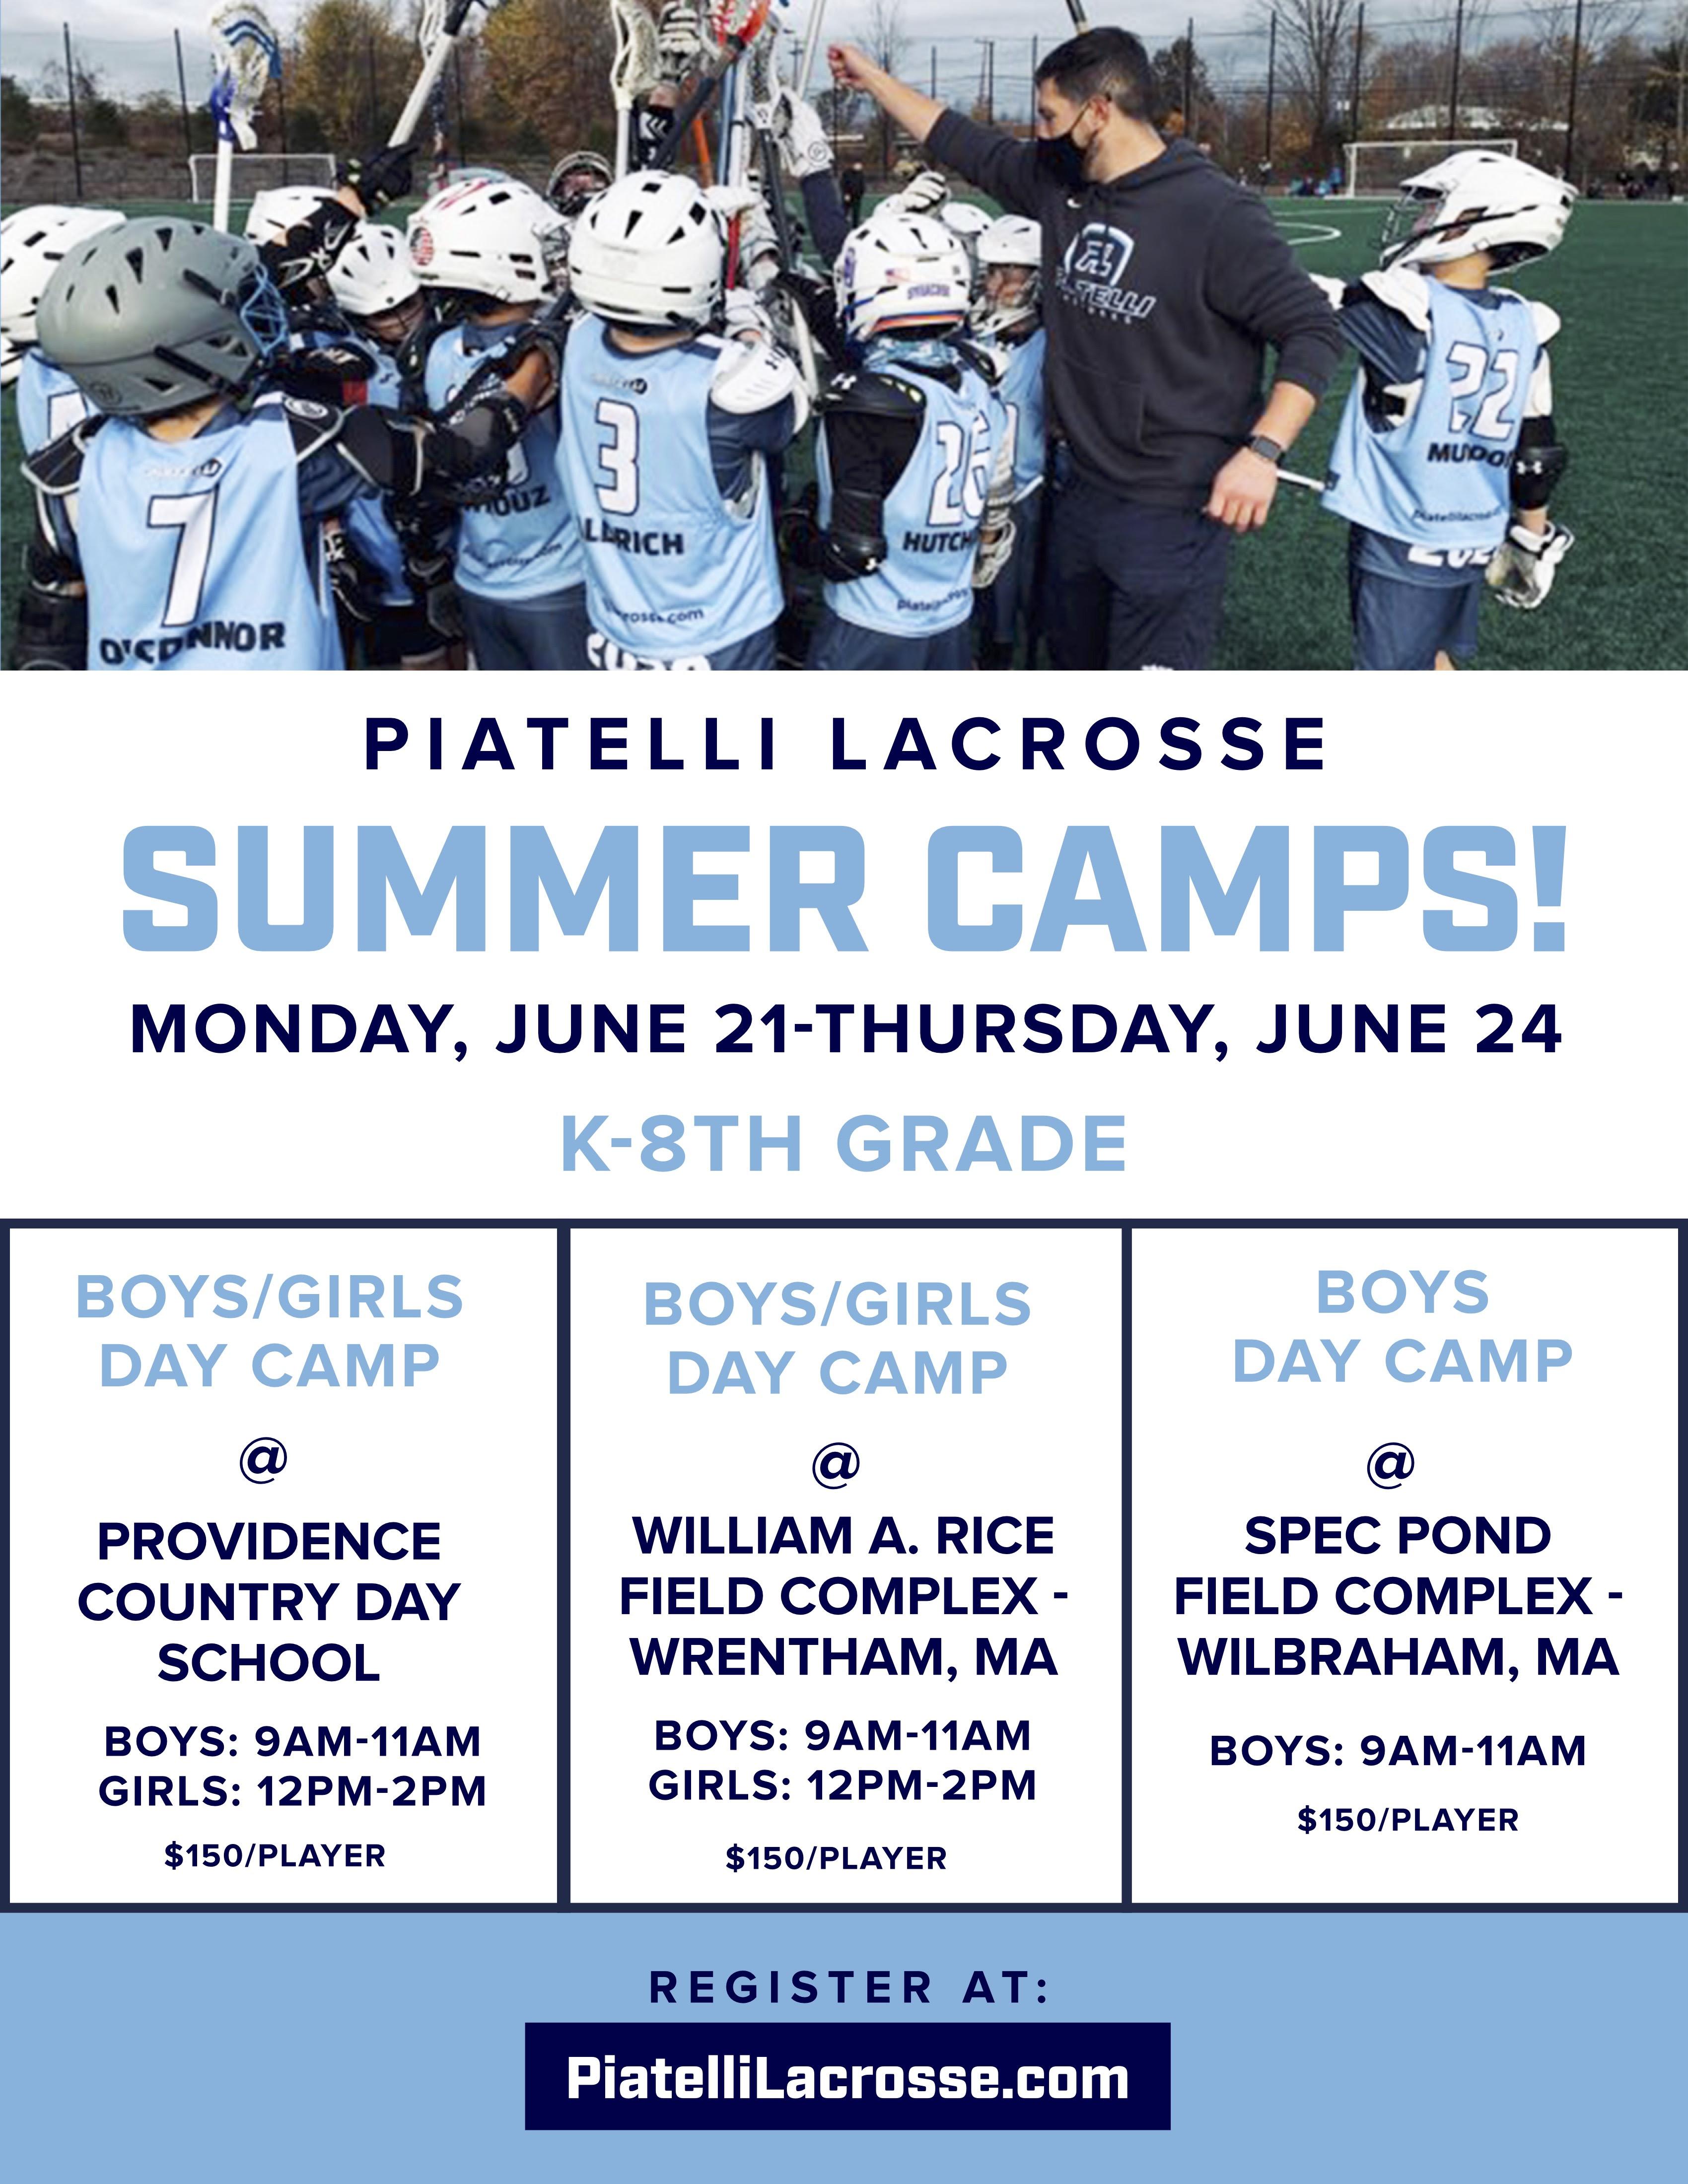 Piatelli Lacrosse Summer Camp